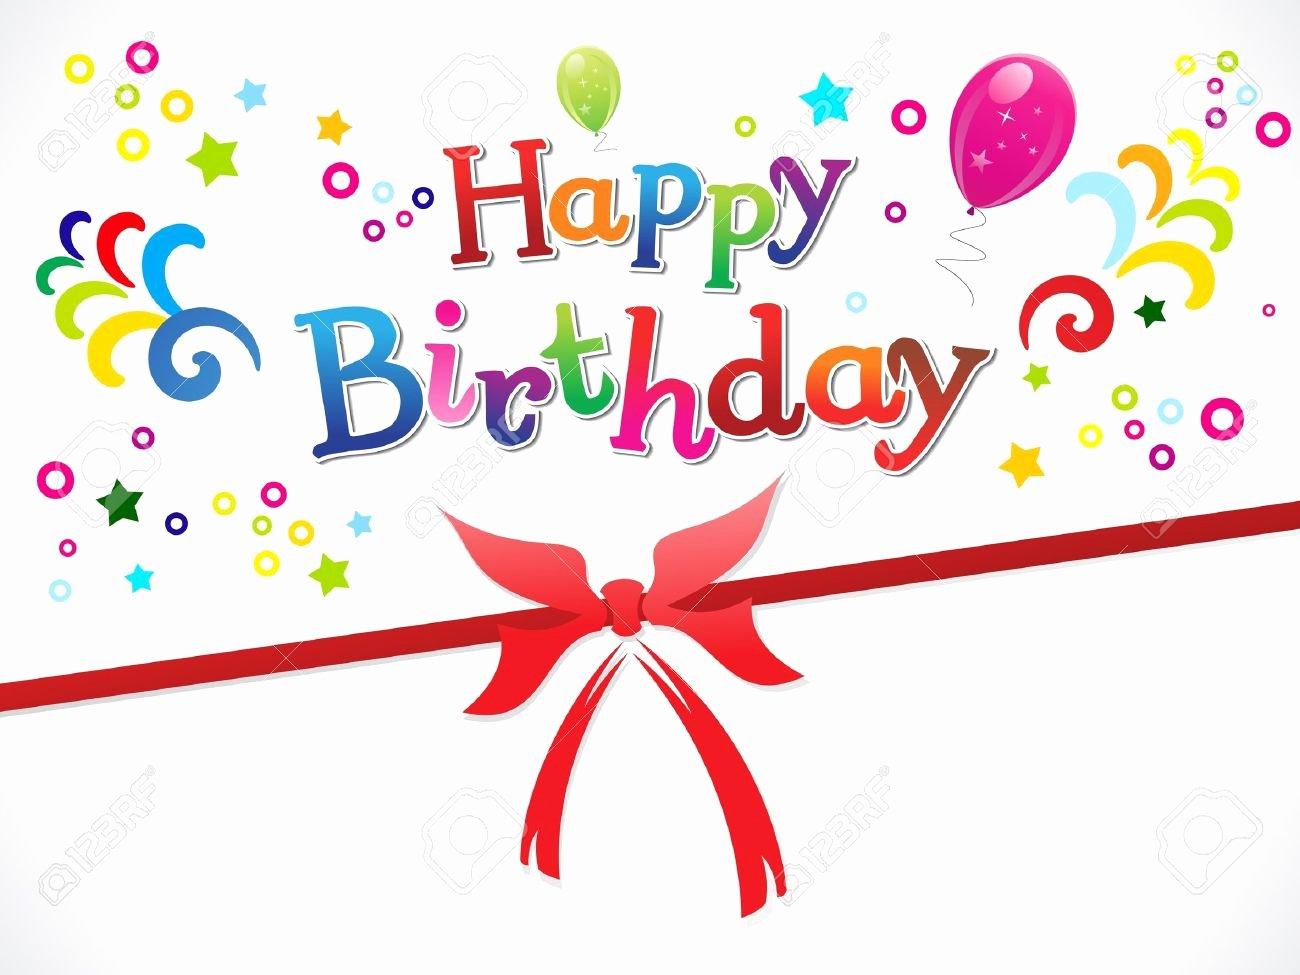 Happy Birthday Template Word Luxury Birthday Card Template